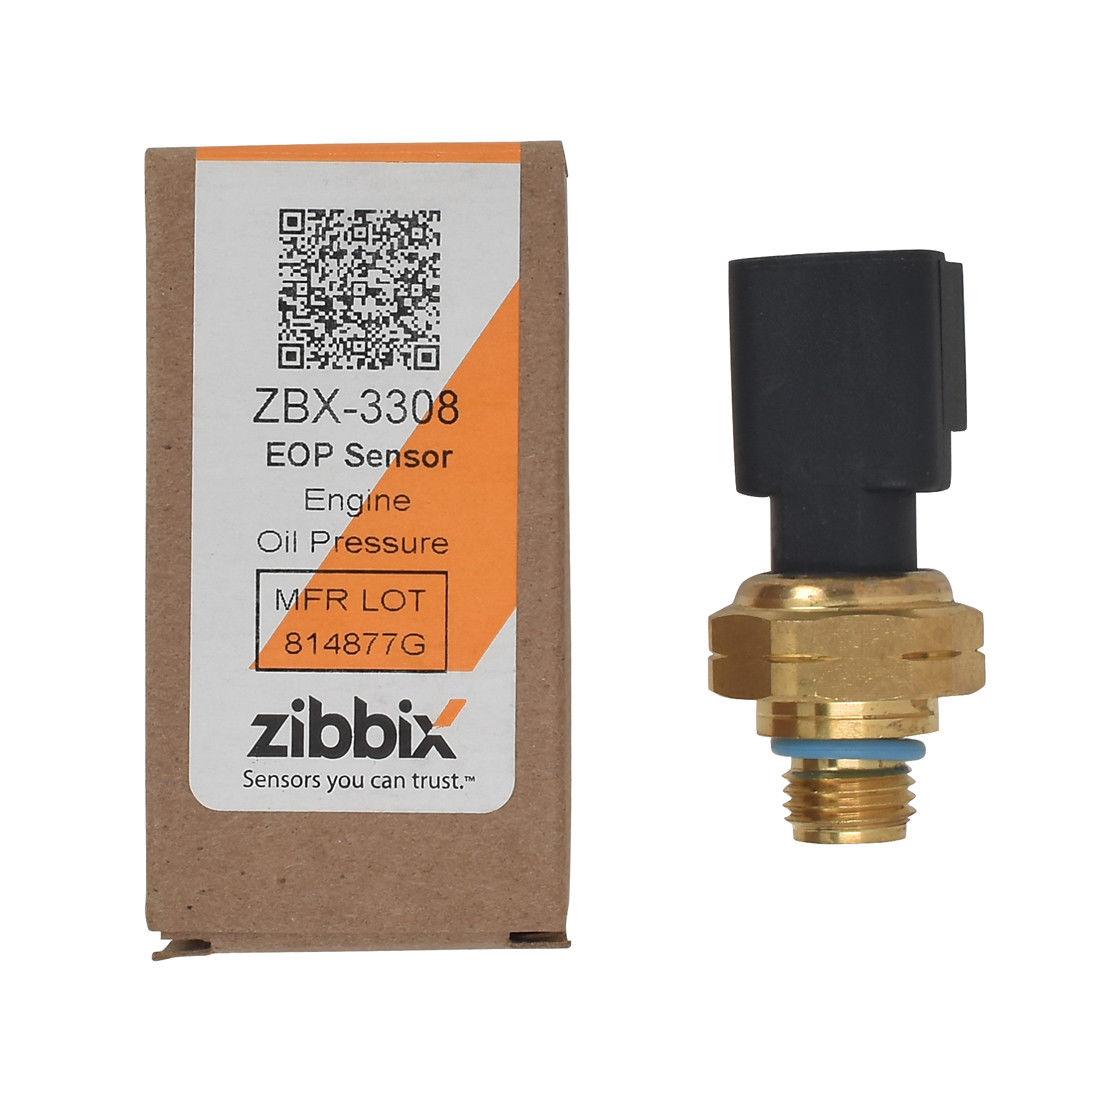 Zibbix ZBX-3308 EOP Engine Oil Pressure Sensor For ISX ISM ISL ISB Cummins Freightliner Kenworth